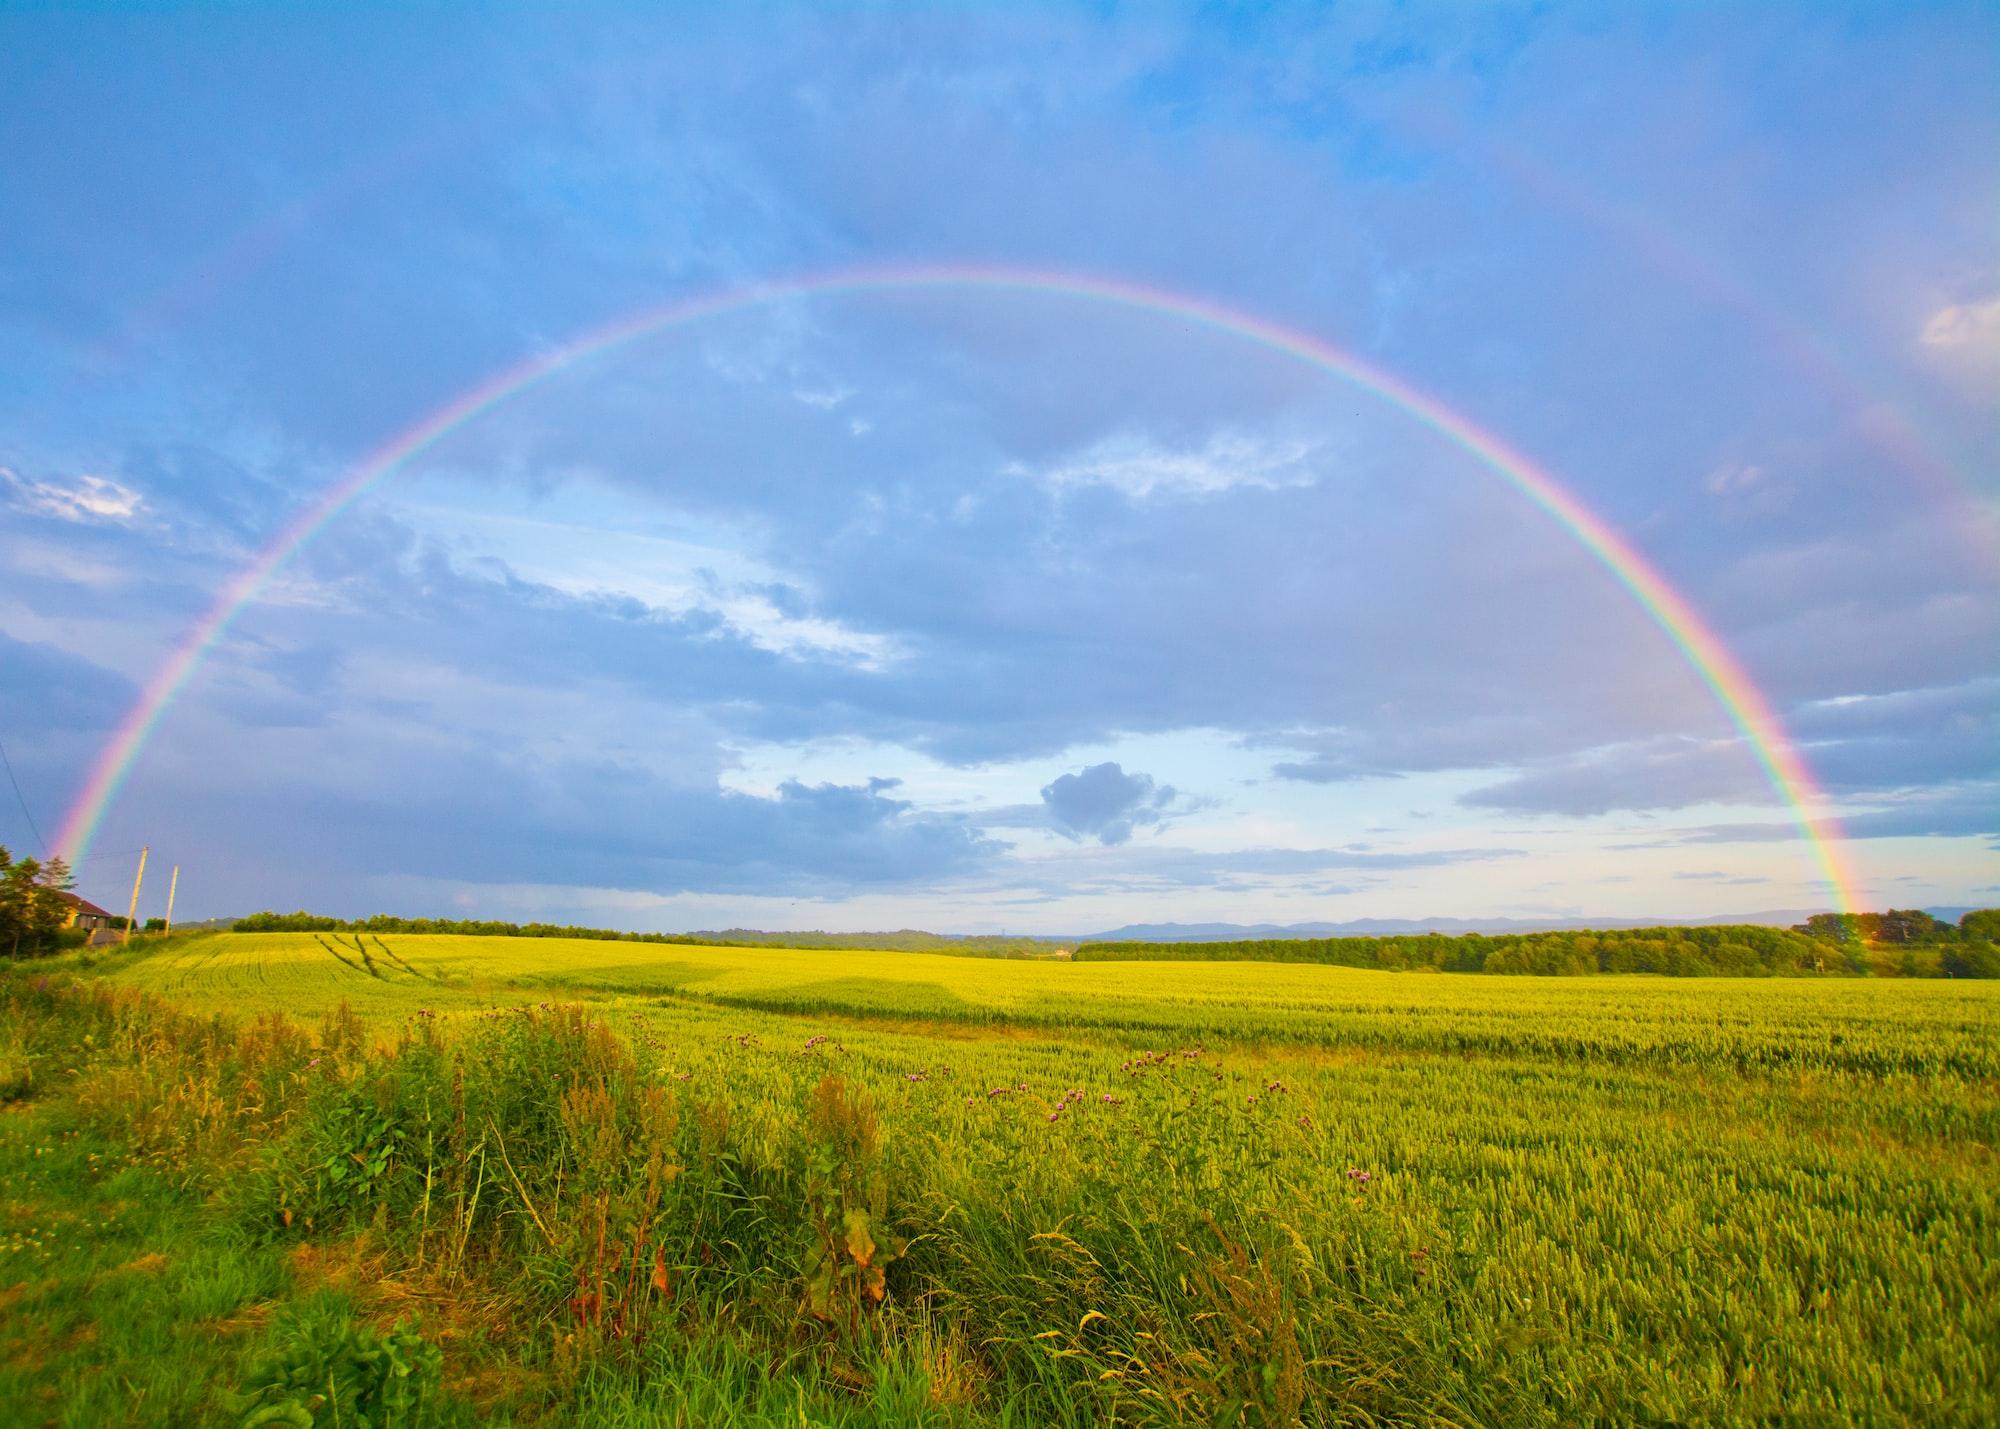 Somewhere Over The Rainbow-What A Wonderful World (Israel Kamakawiwoʻole)